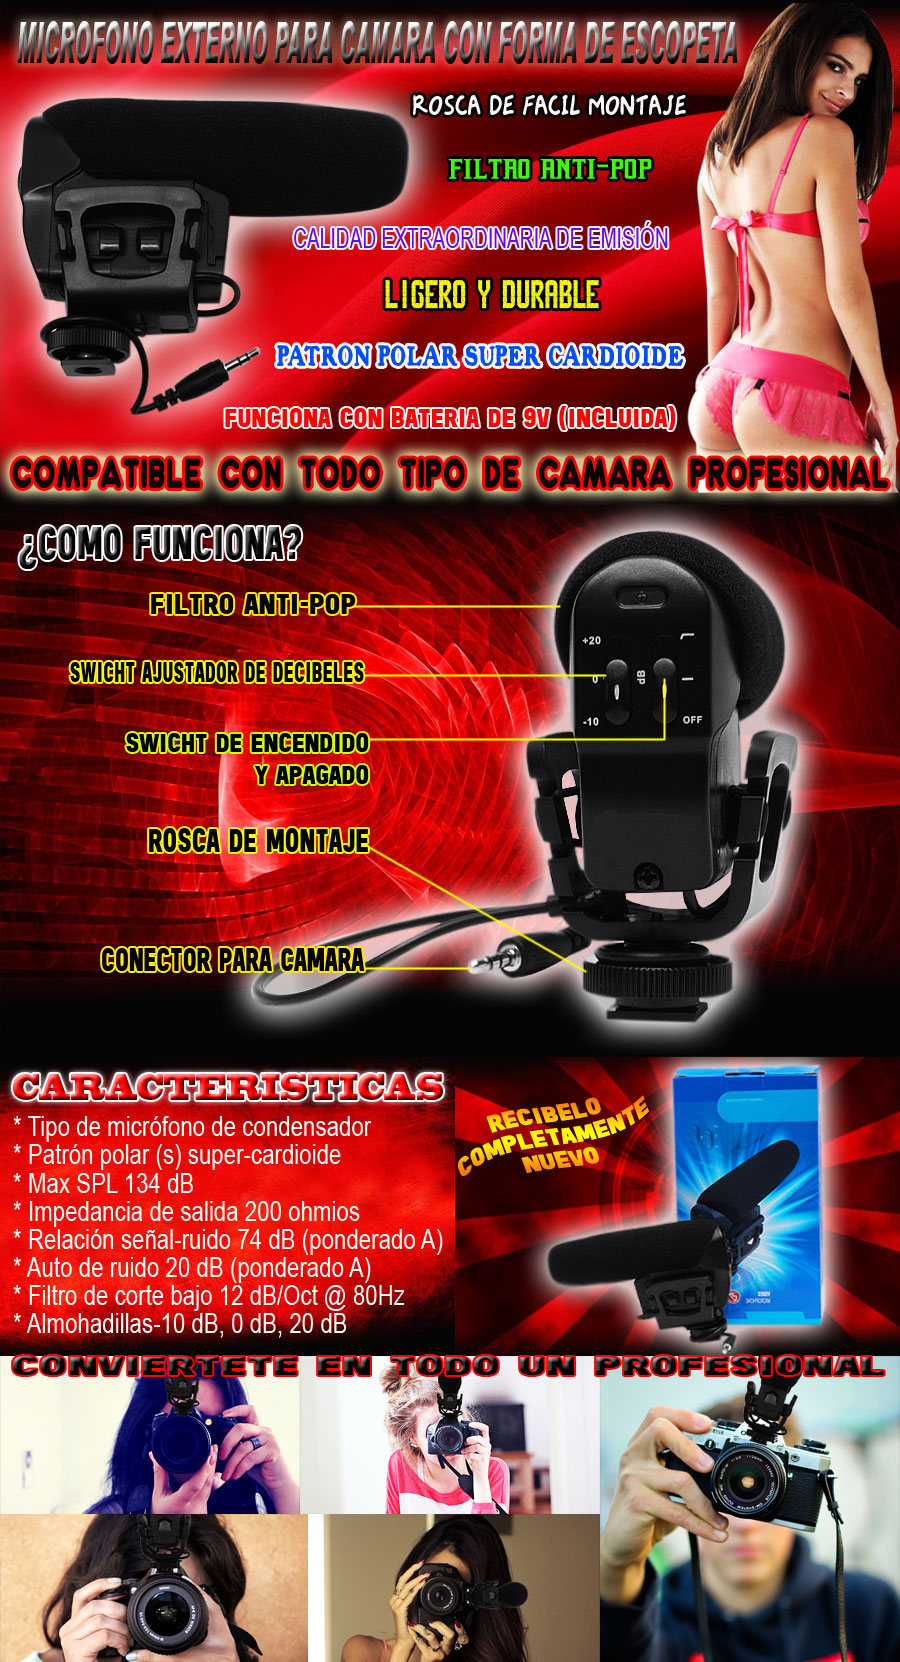 http://lomejorenvideo.com/img-van/microfono-camara/principal.jpg